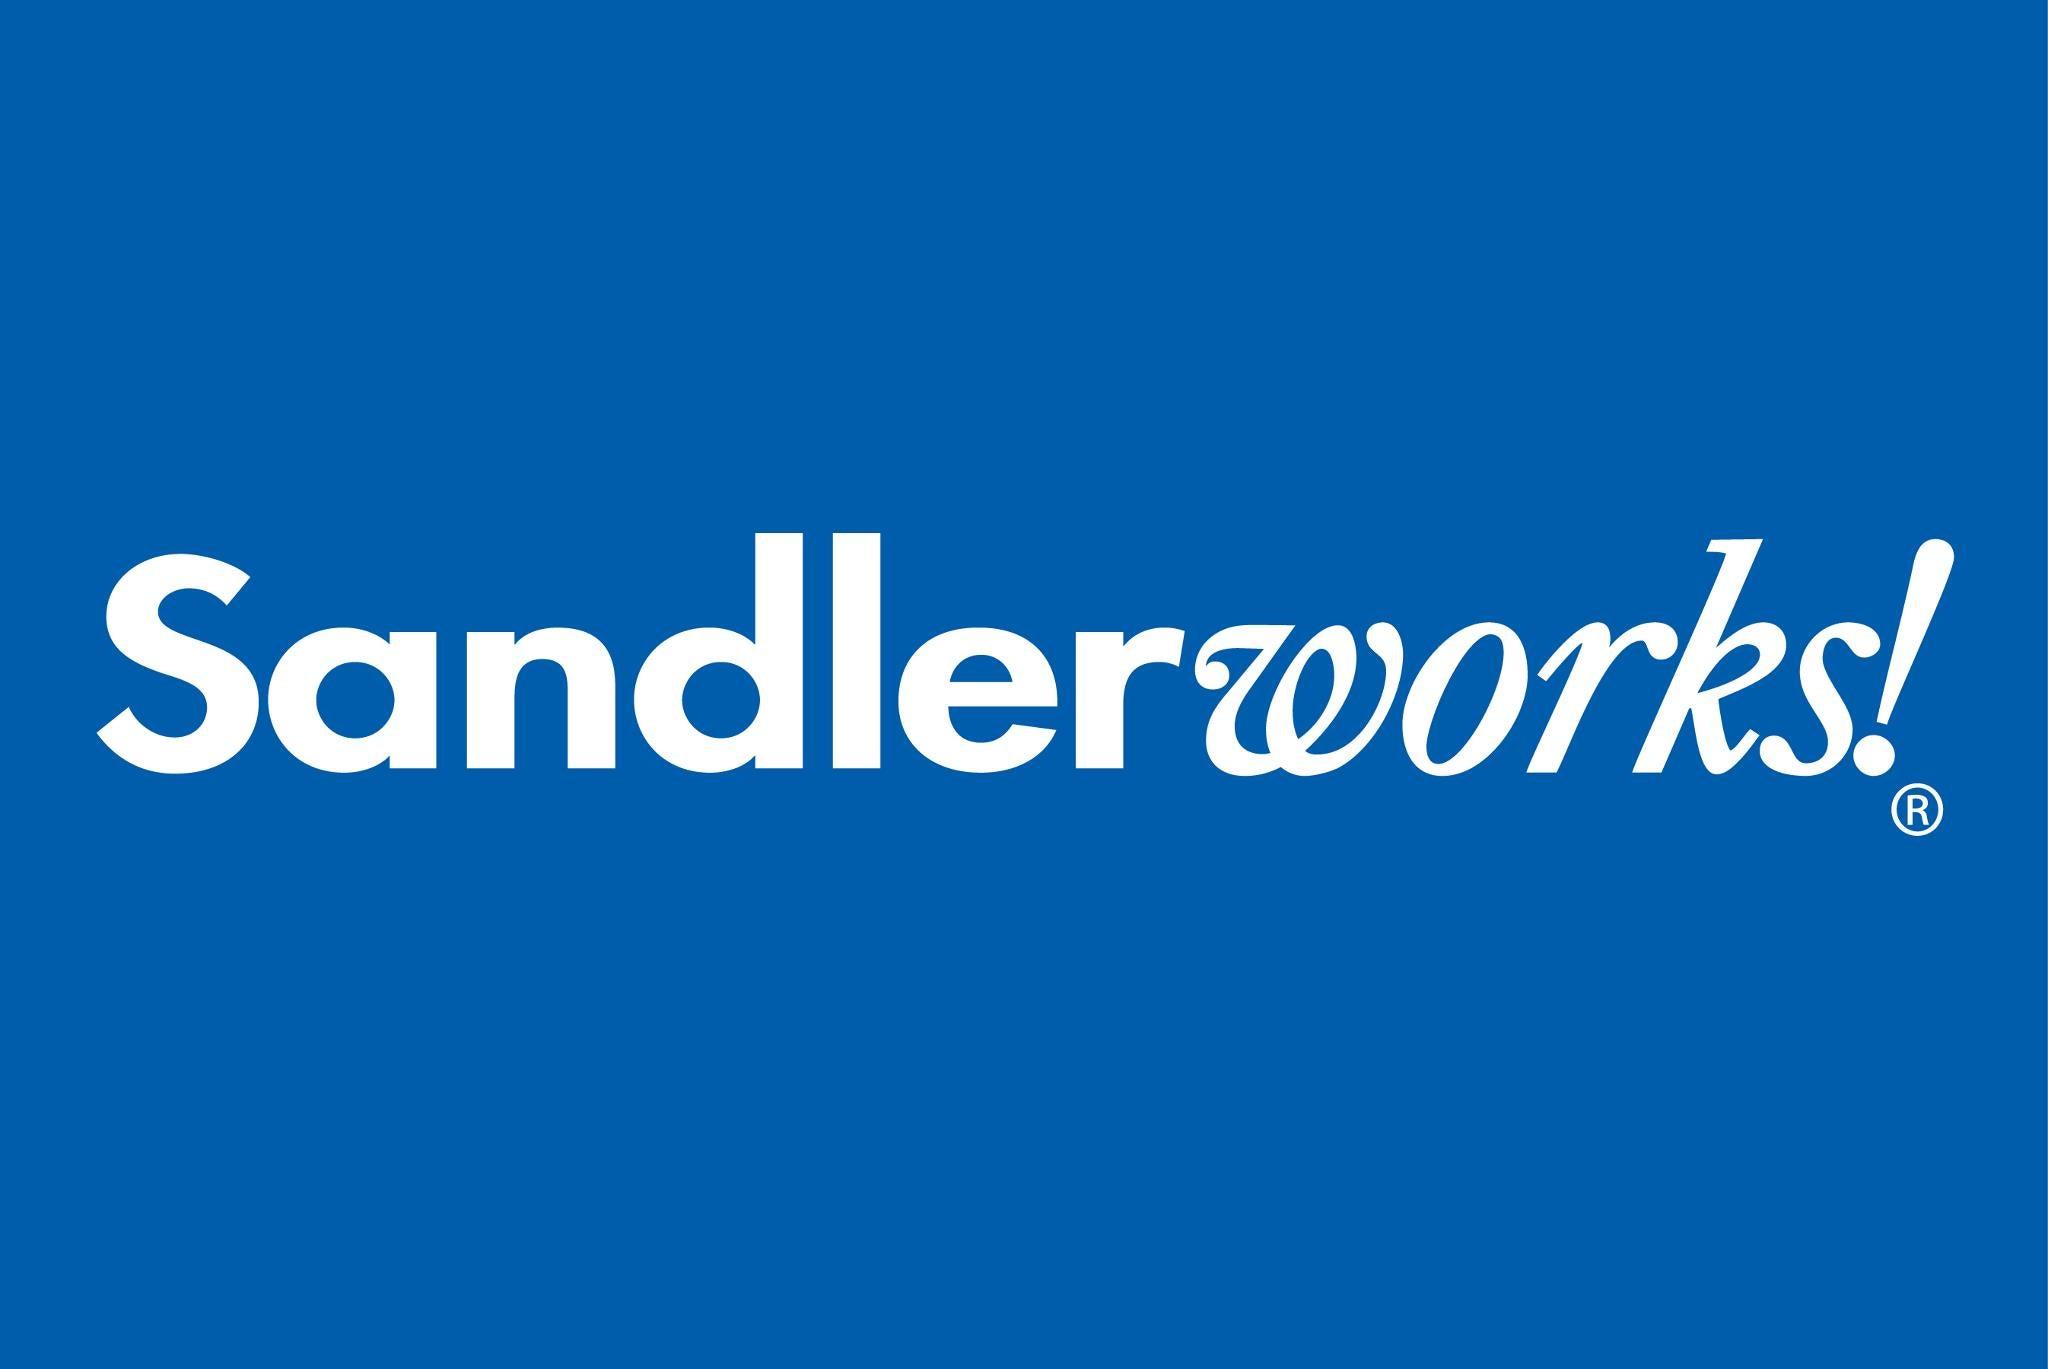 SANDLER TRAINING,sales training,sandler training